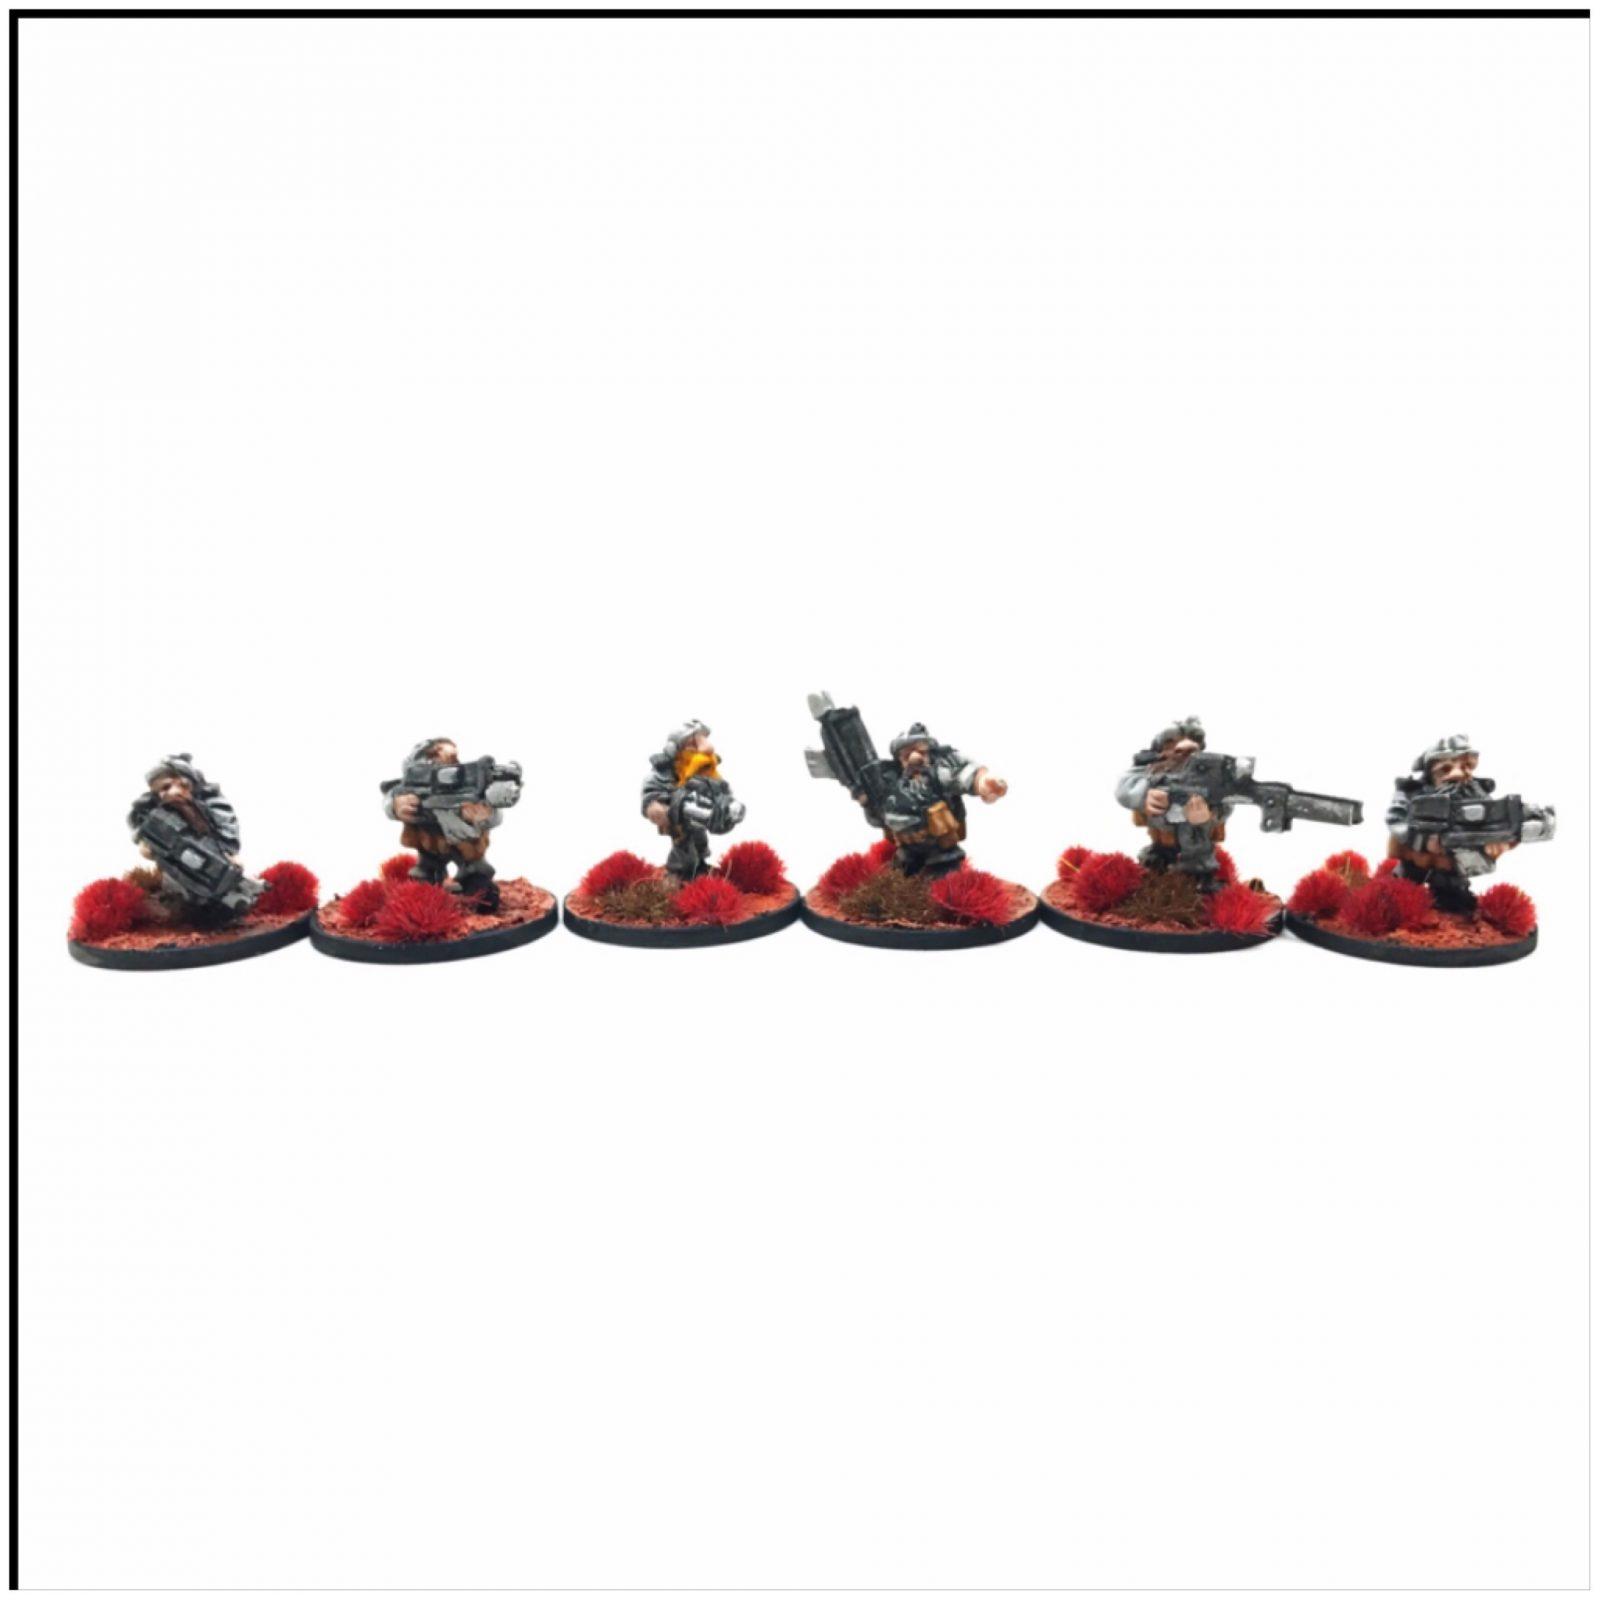 Dwarf Hearthguard – Pack 1